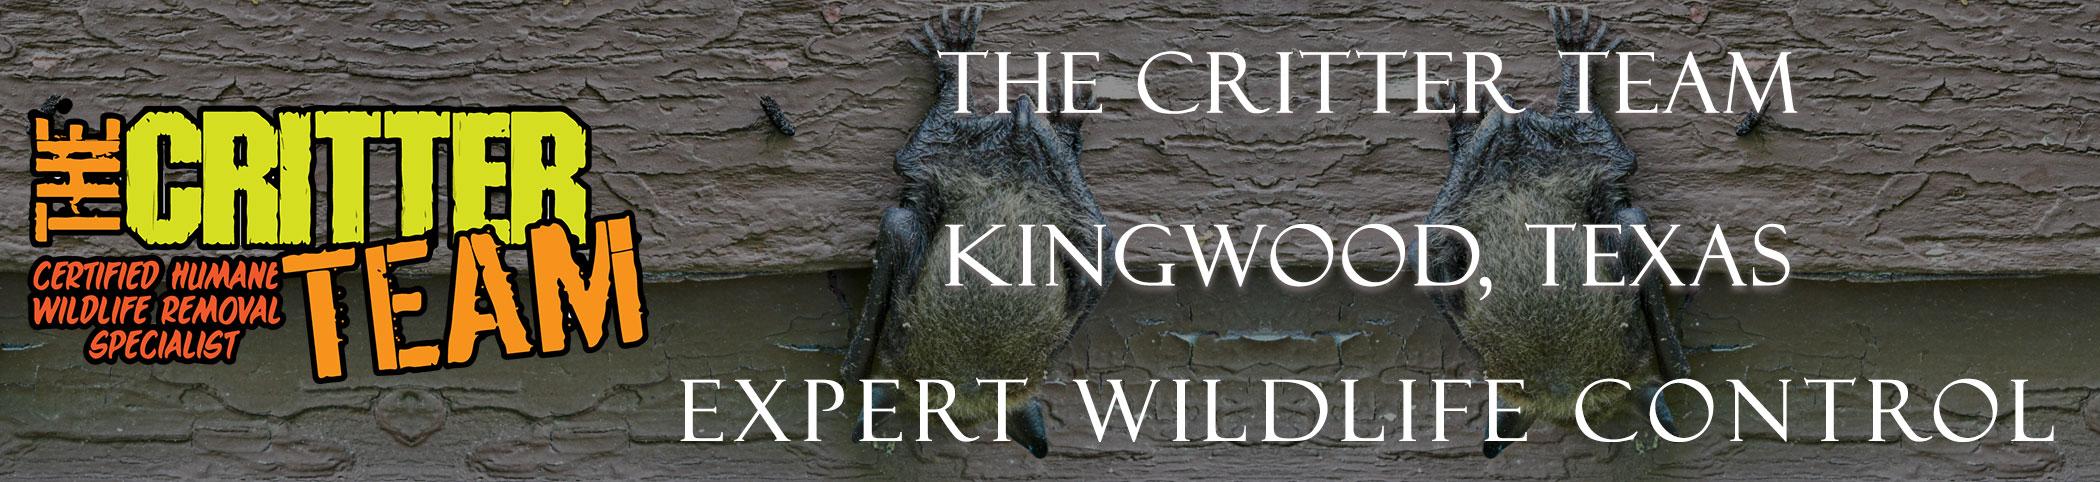 kingwood_texas_critter_team_headers